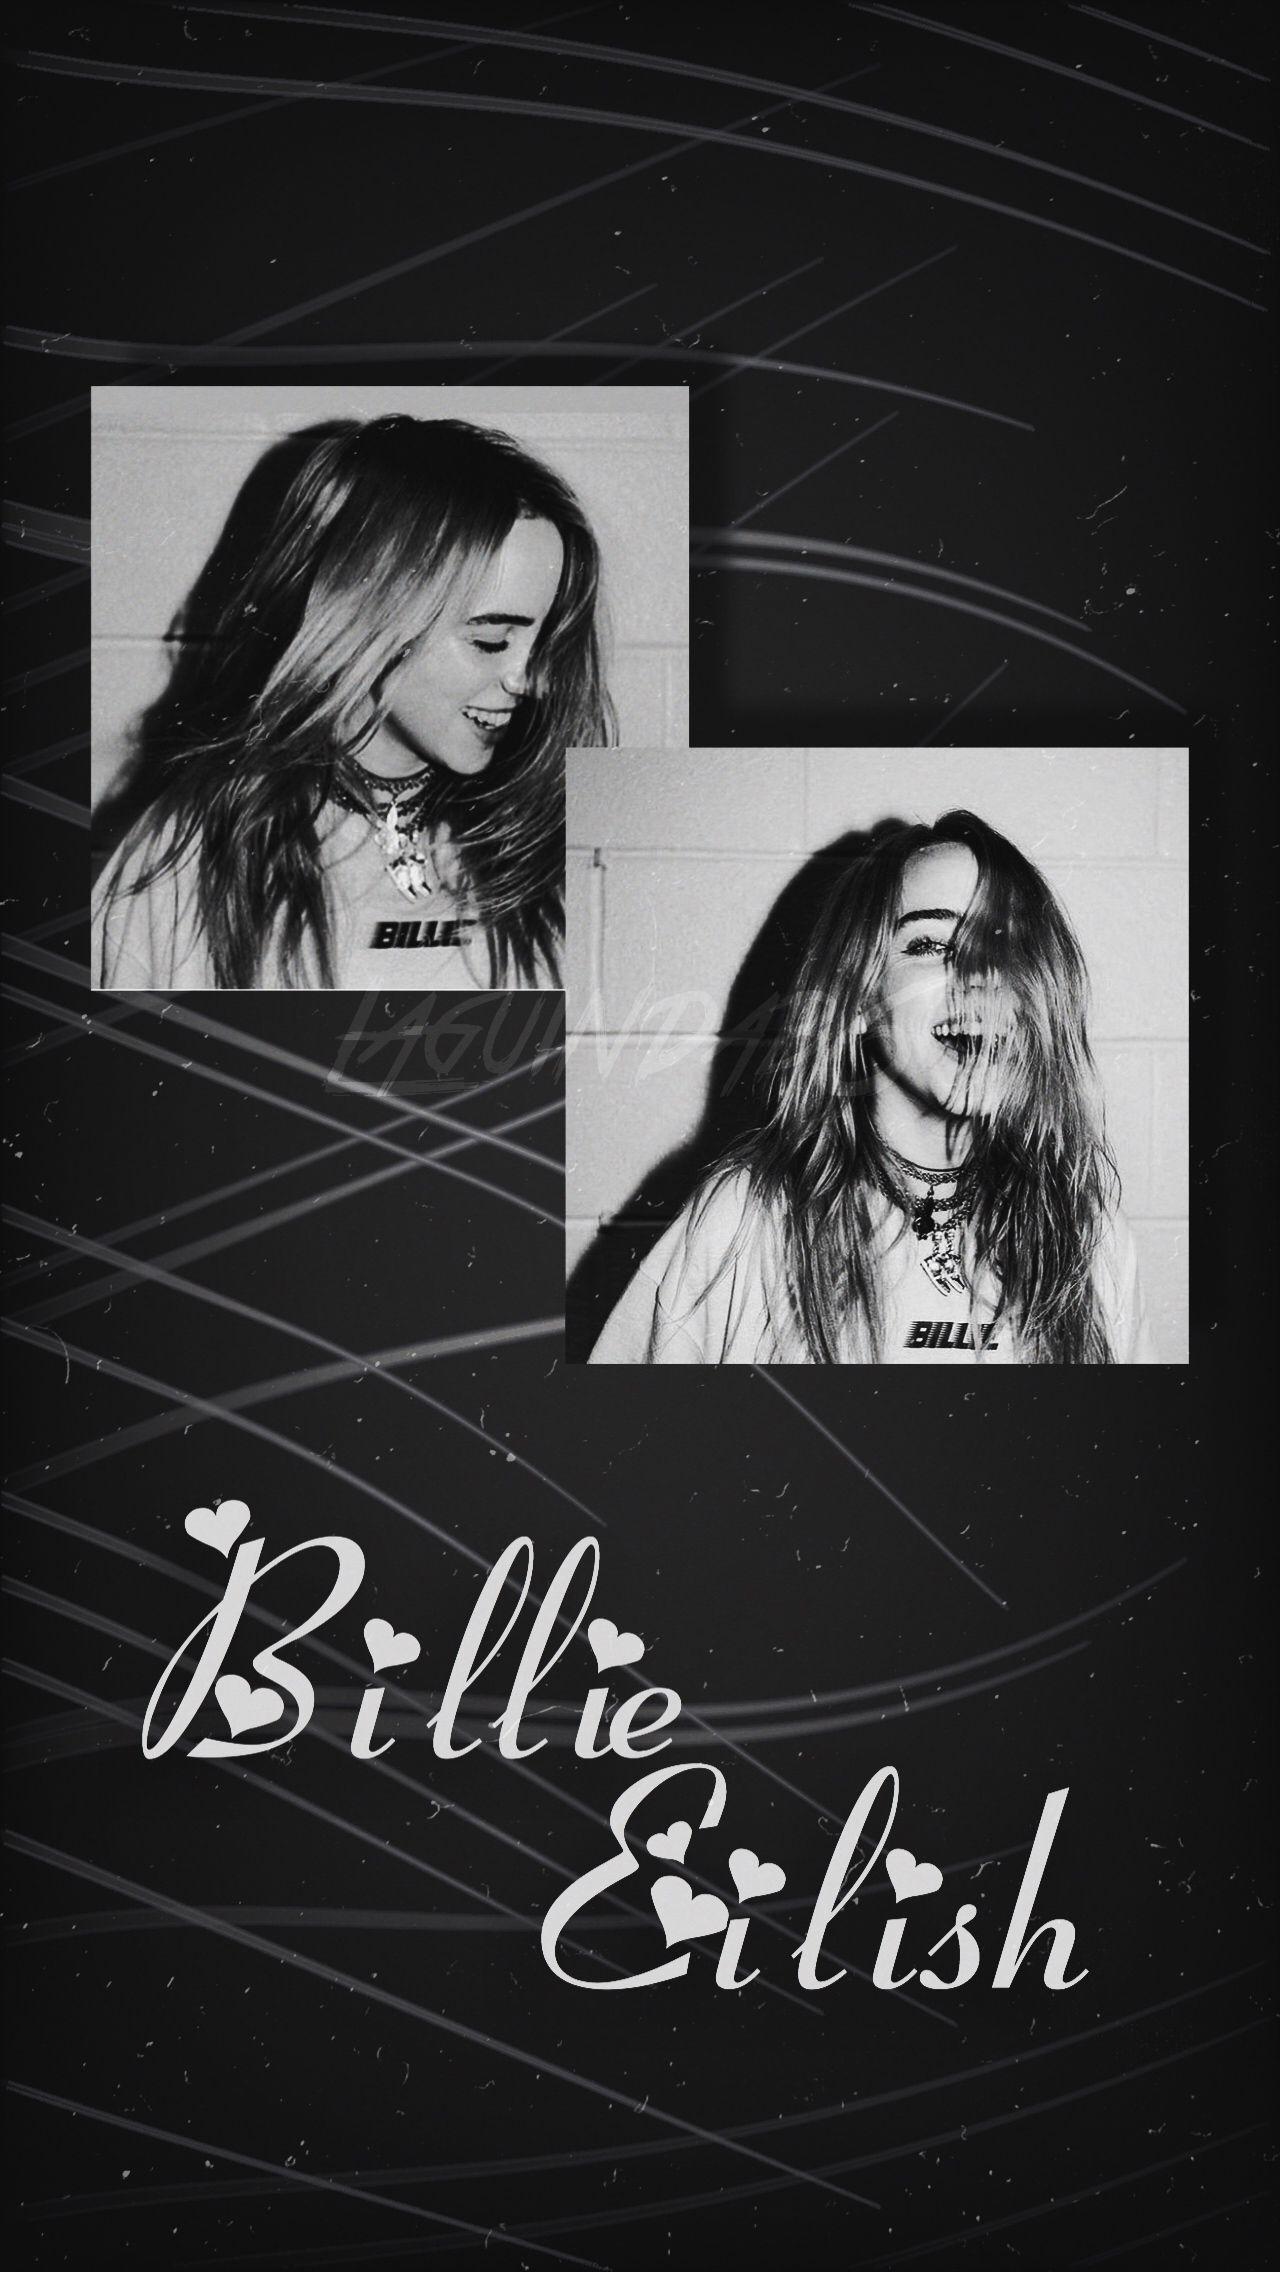 Billie Eilish Wallpaper Laguindab6 Billie Billie Eilish Cute Wallpapers